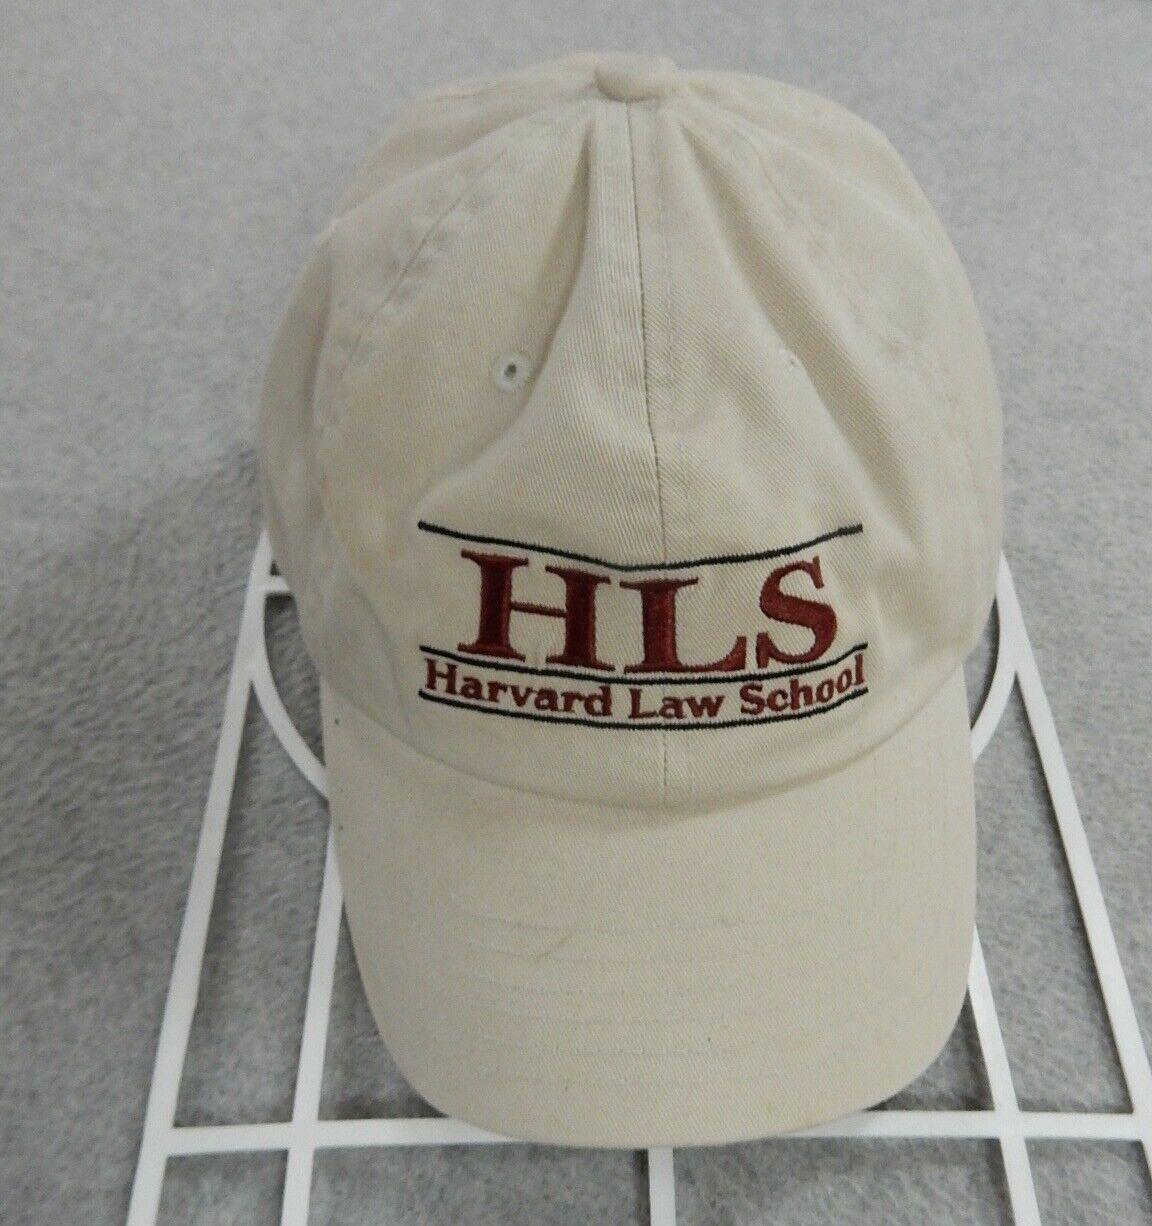 Harvard Law School Stitched LOGO Adjustable Bookstore Hat Cap (Adult) Tan